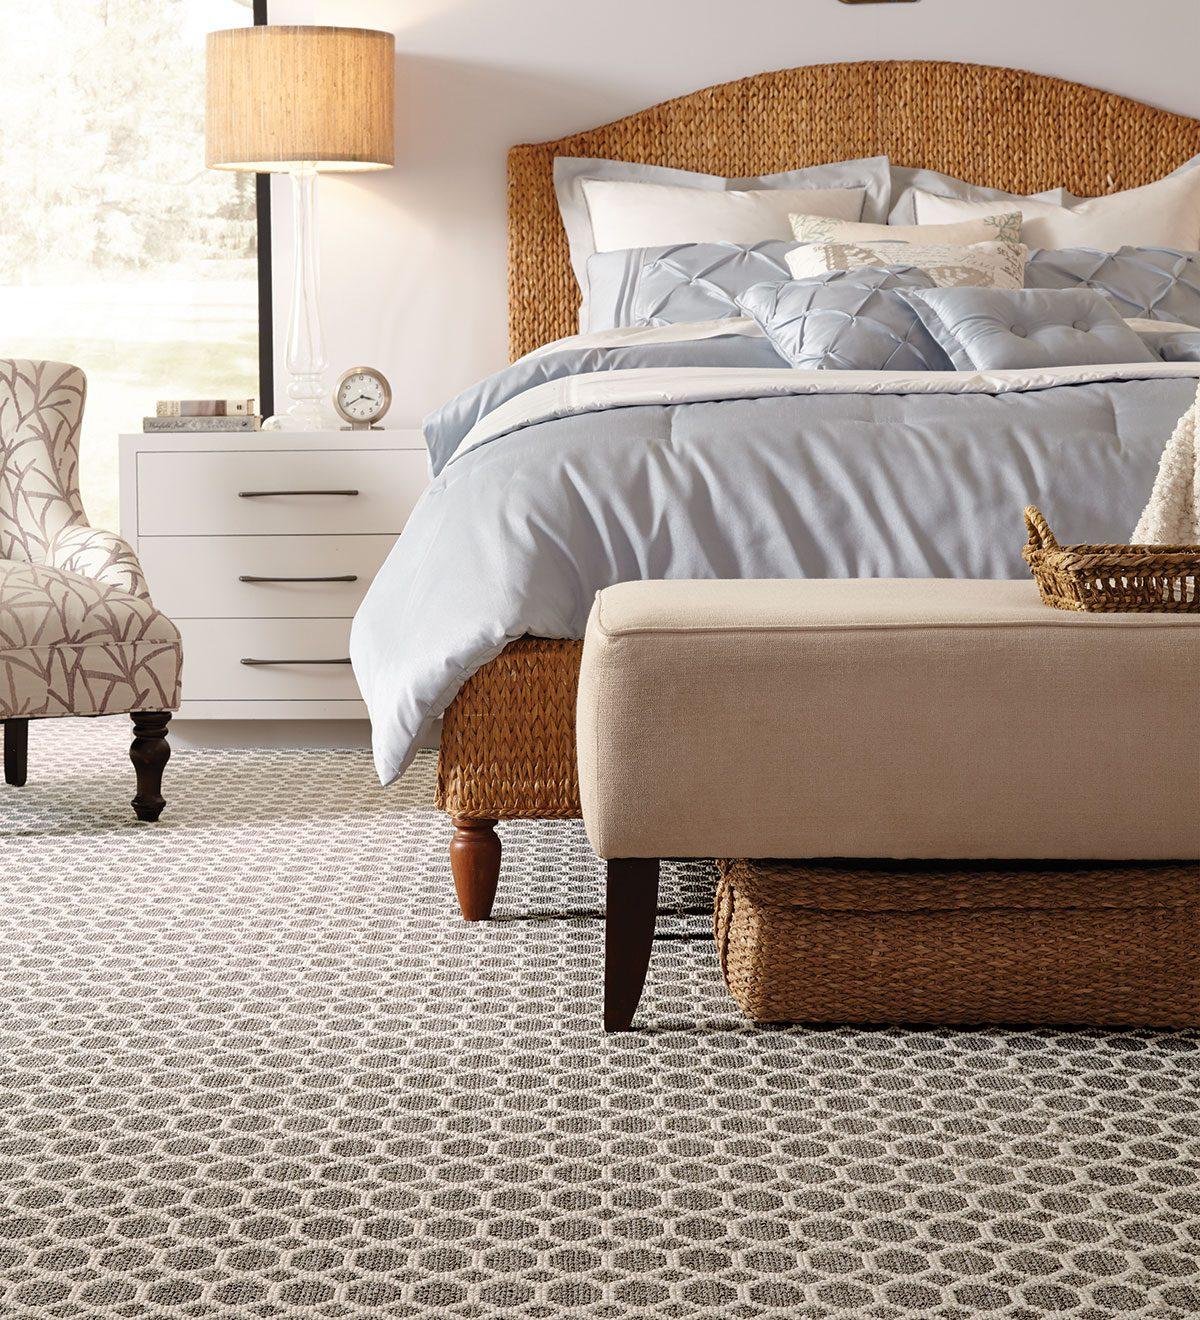 Product 12 bode floors for Bode floors columbia